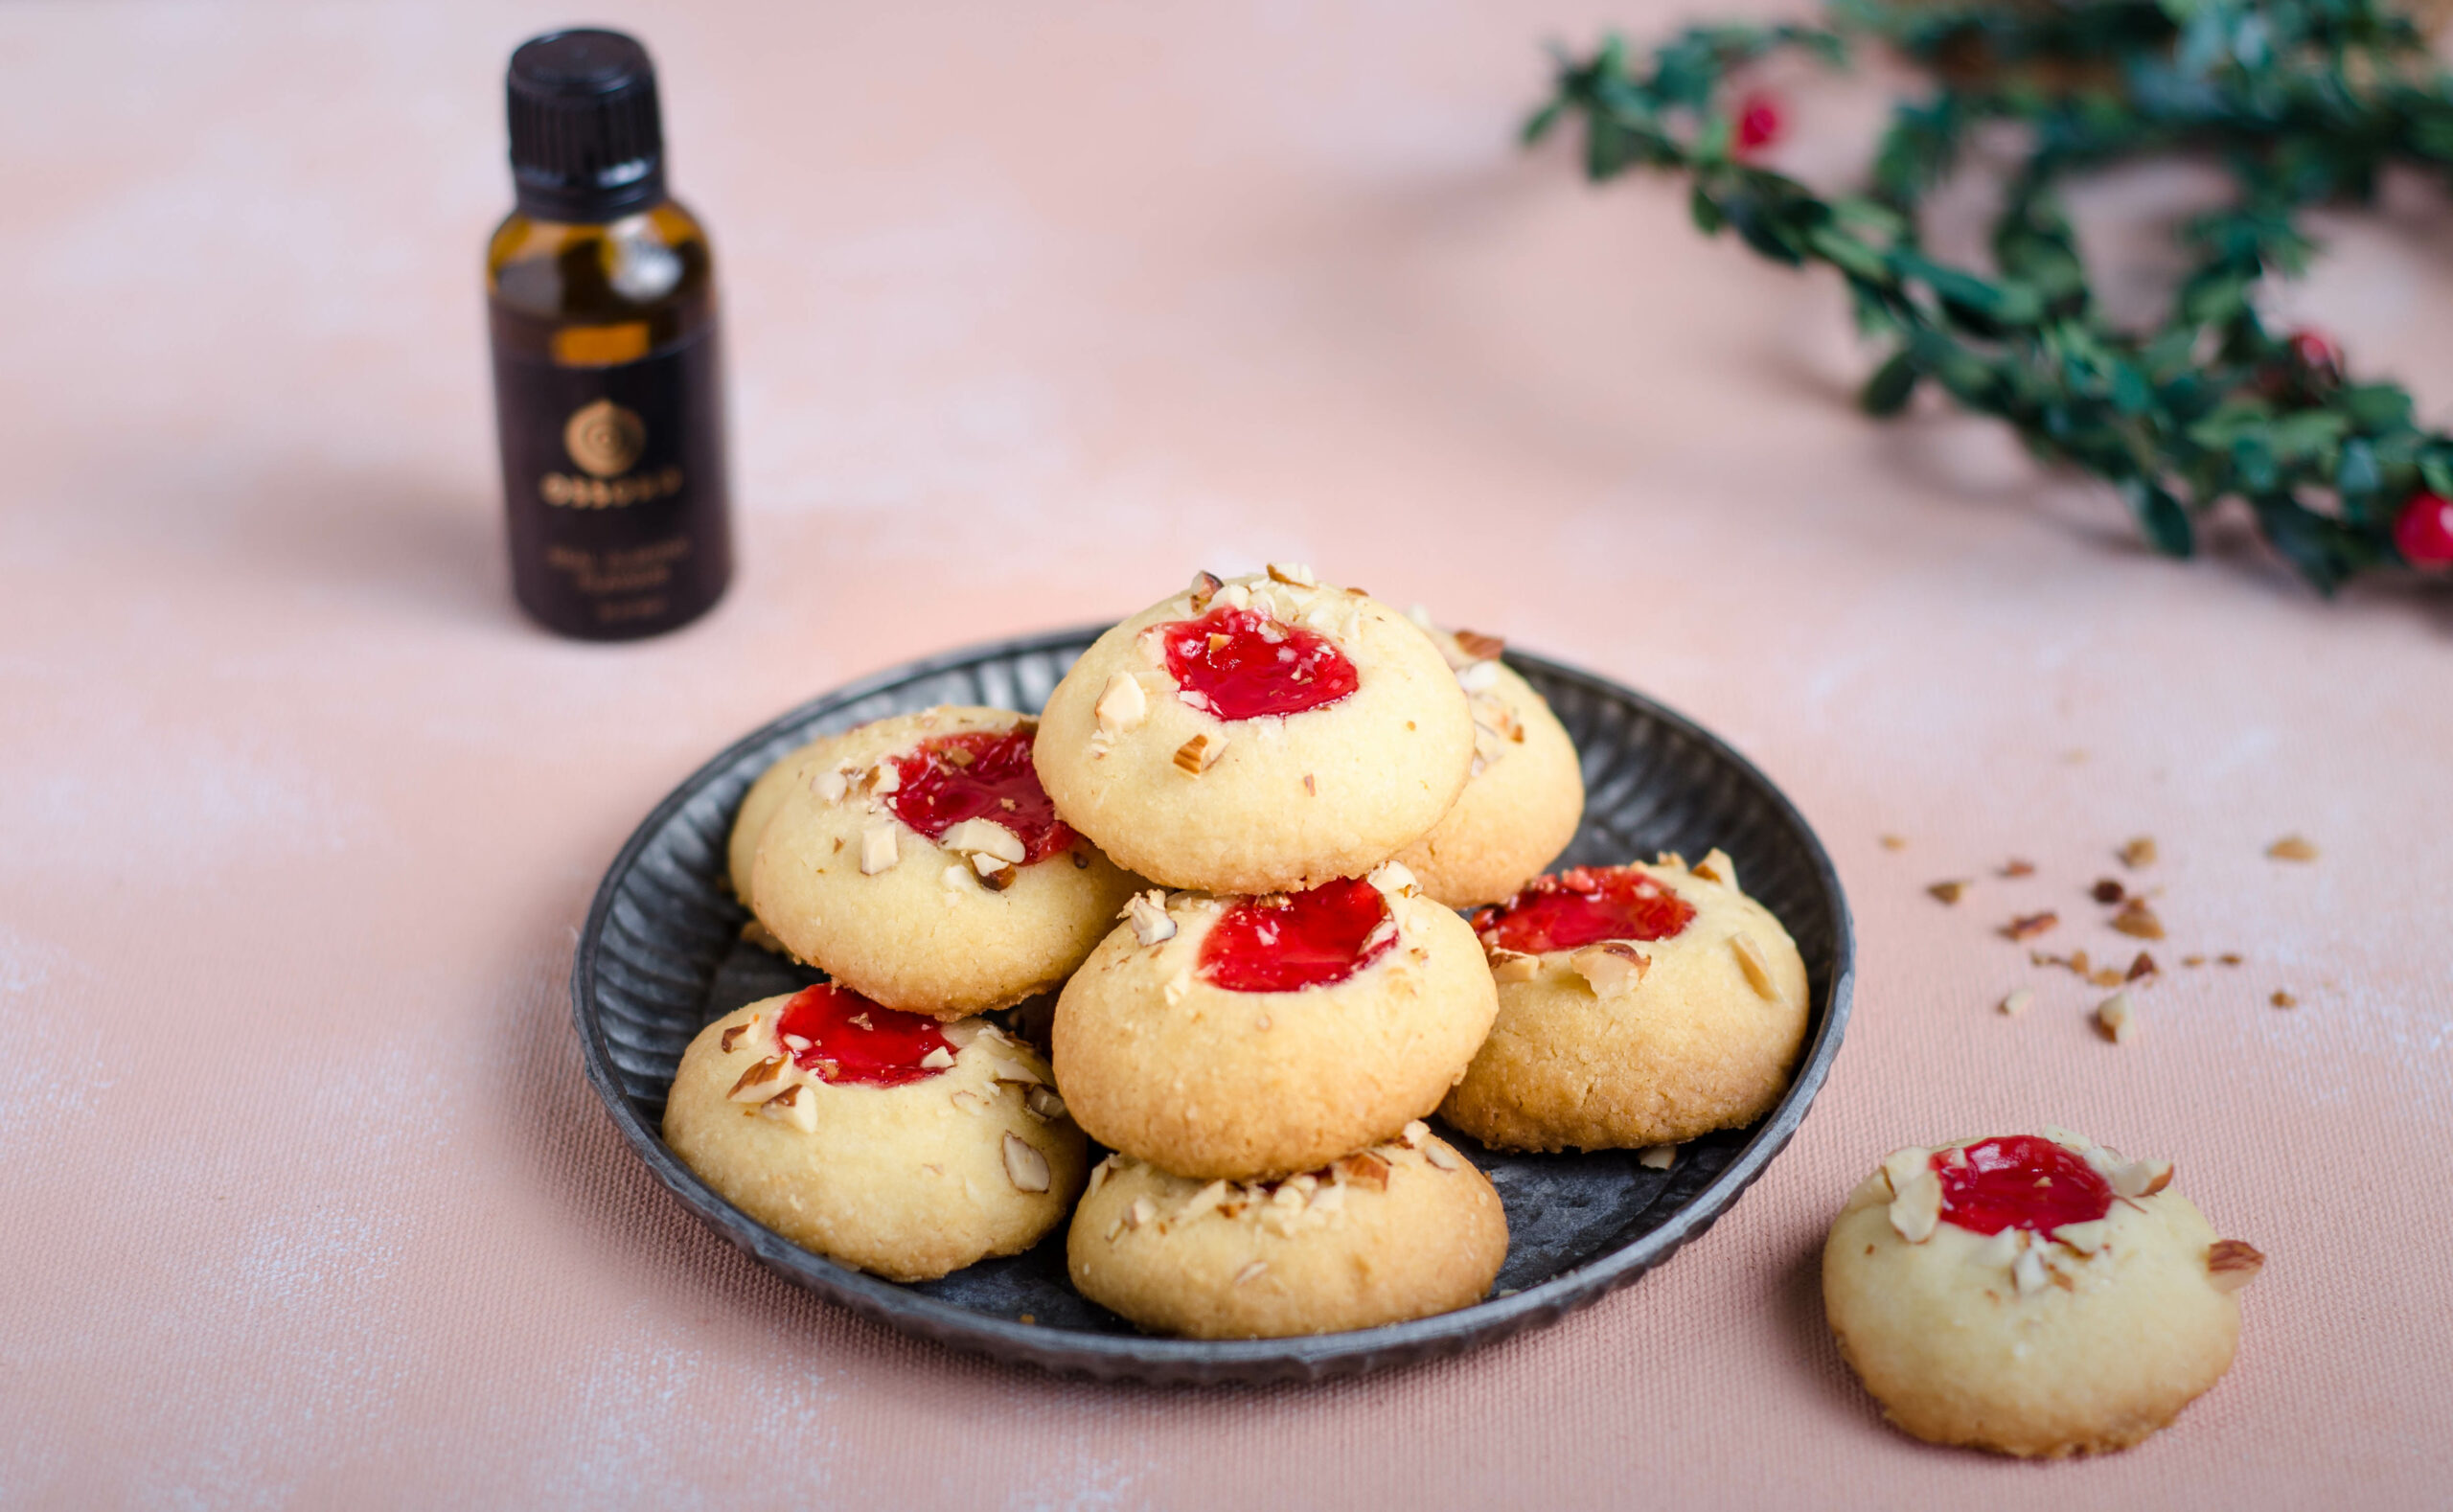 thumbprint cookies-7583-2